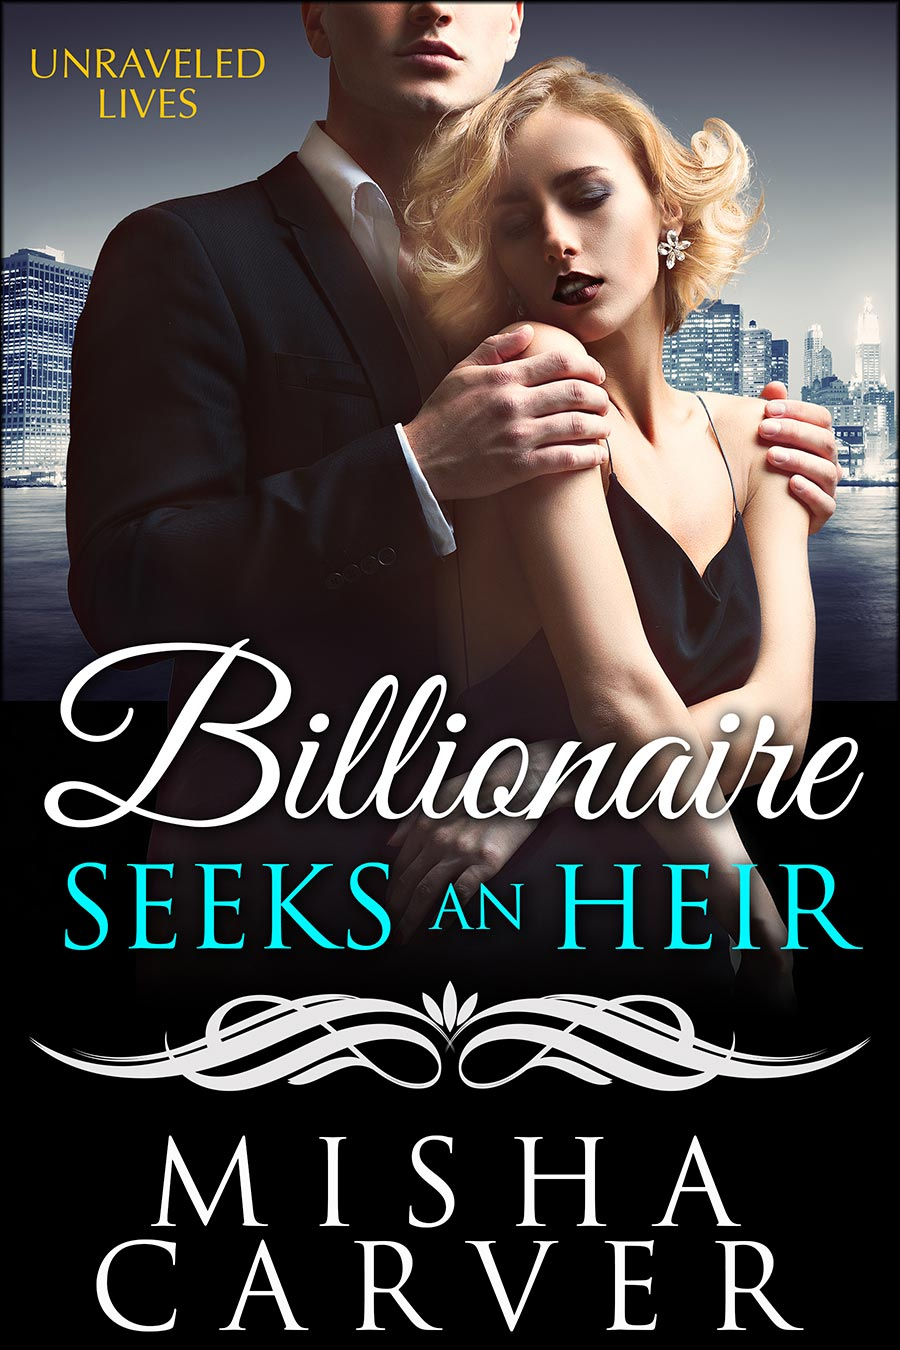 Billionaire-Seeks-an-Heir-2.jpg